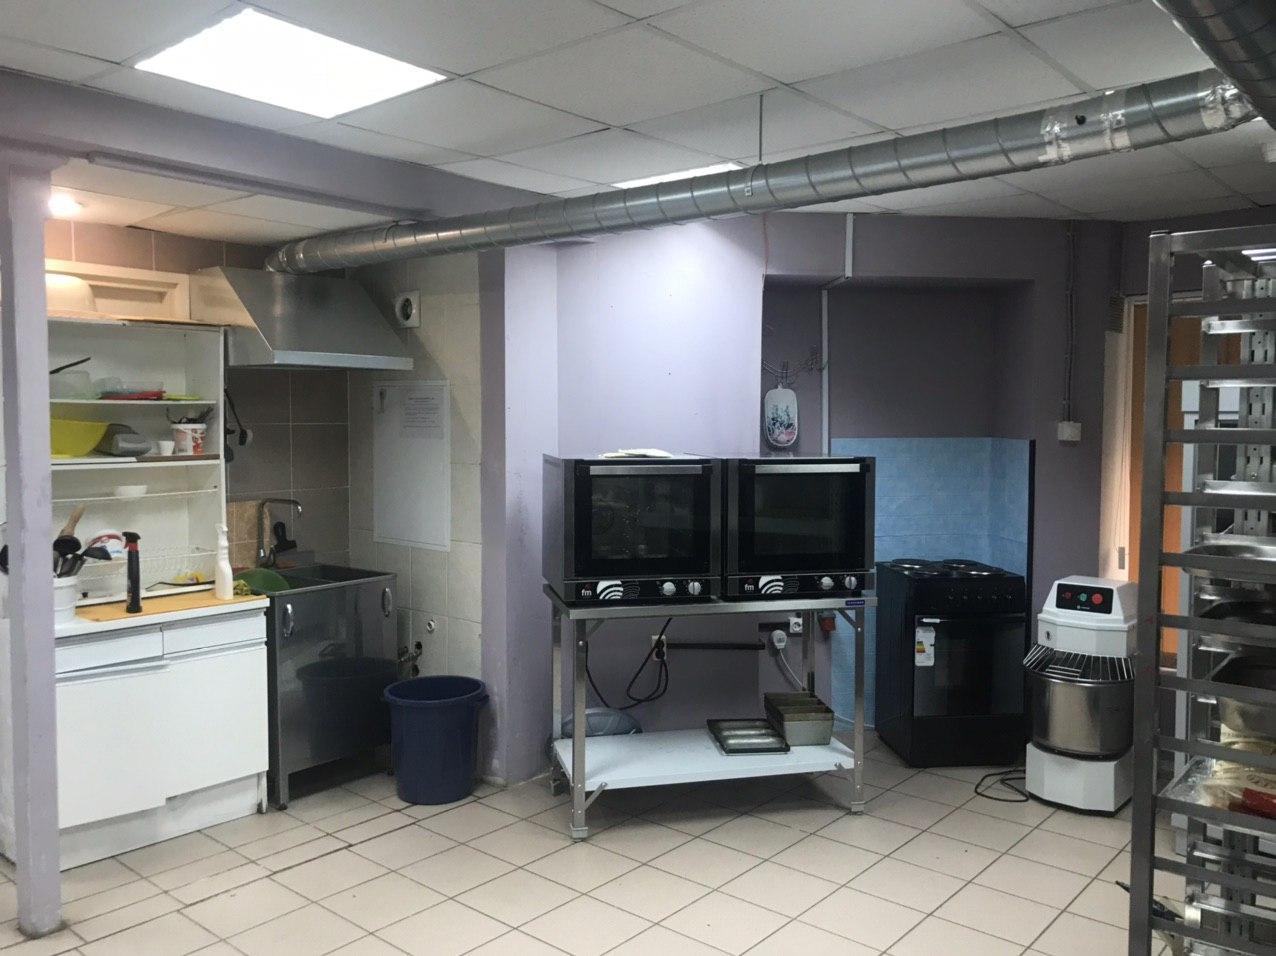 Кафе/Пекарня/Кондитерская/Шаверма/Бургерная